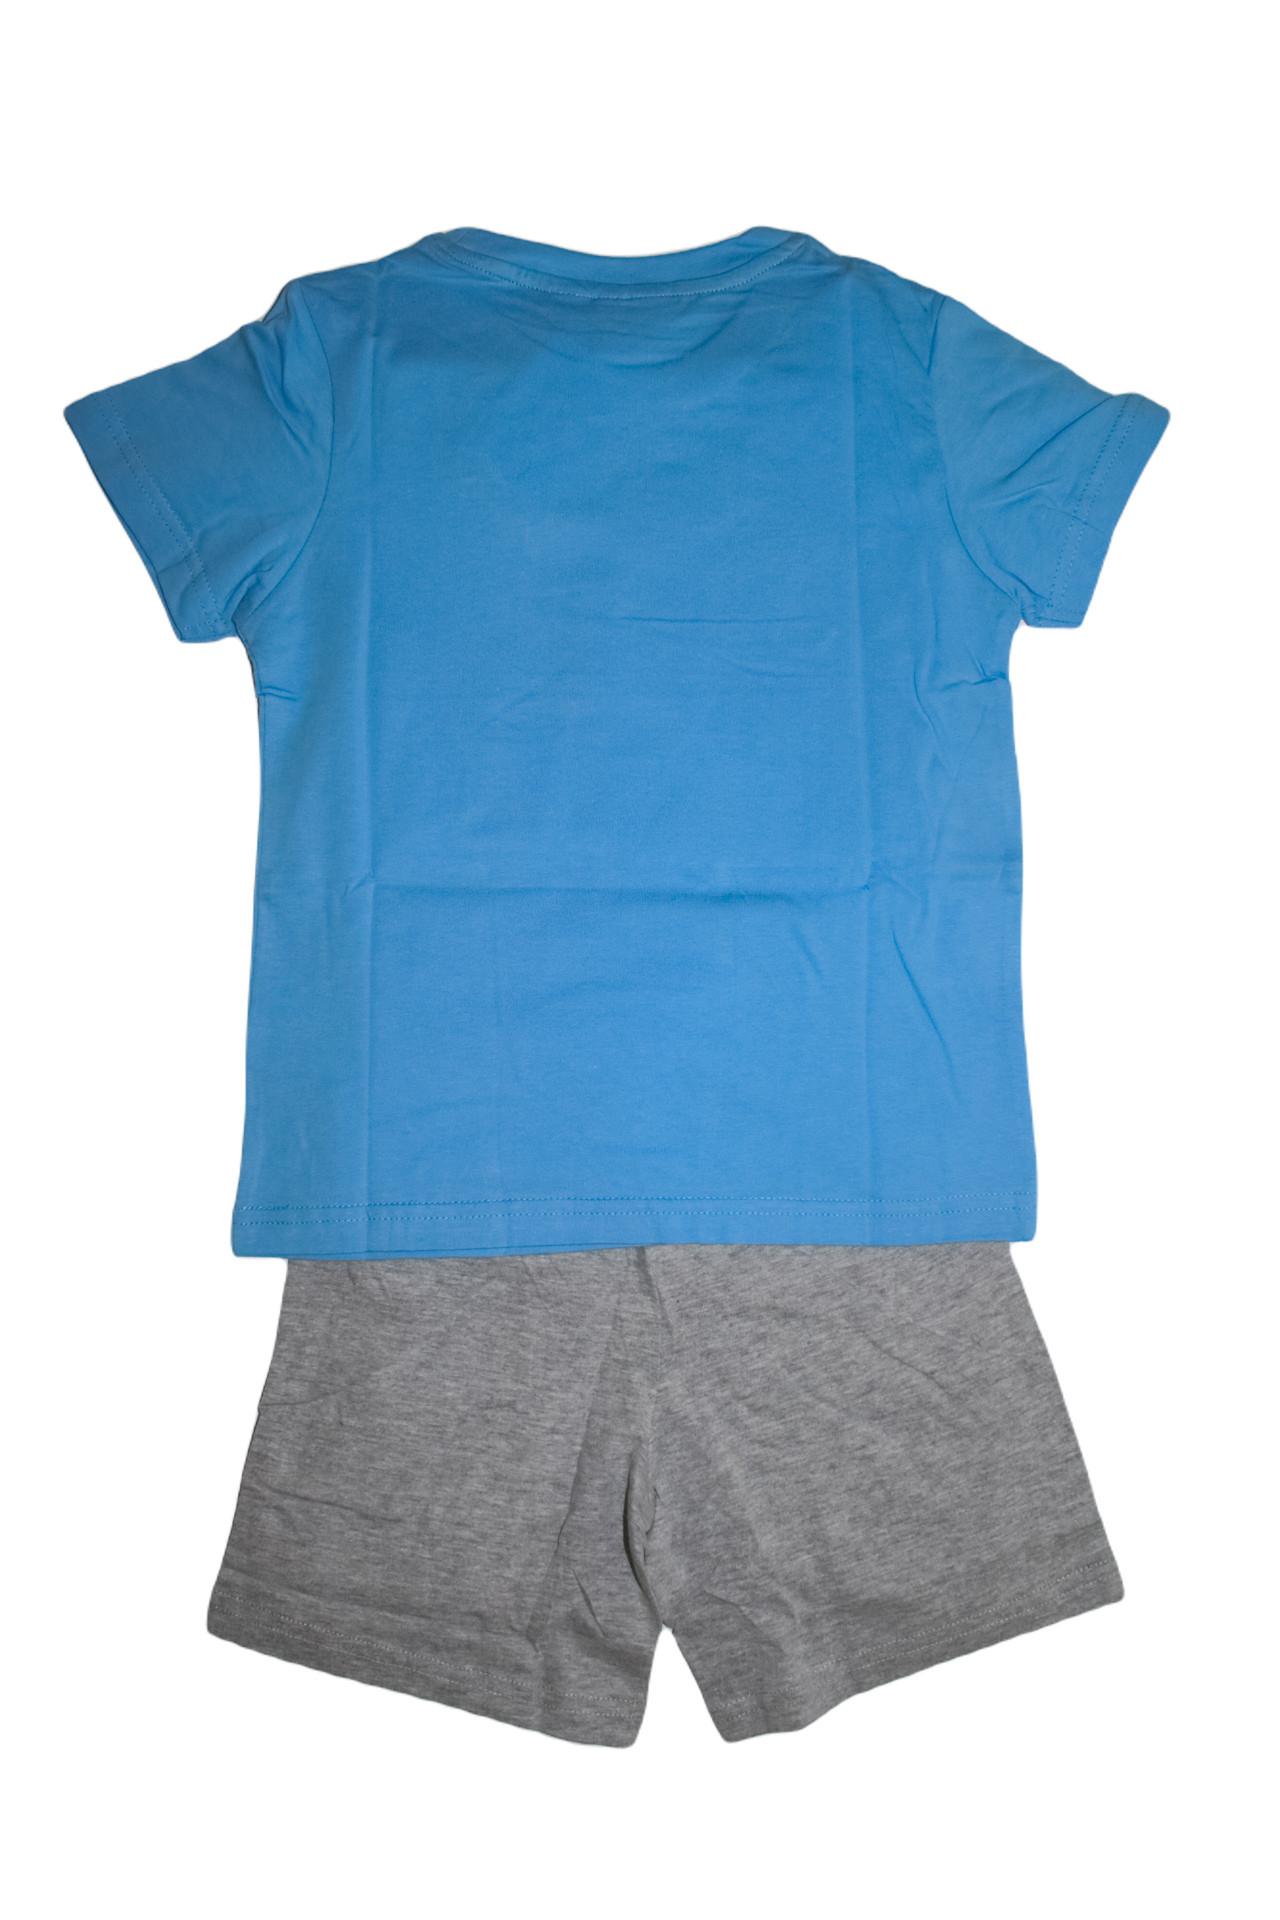 Футболка с шортами - 2